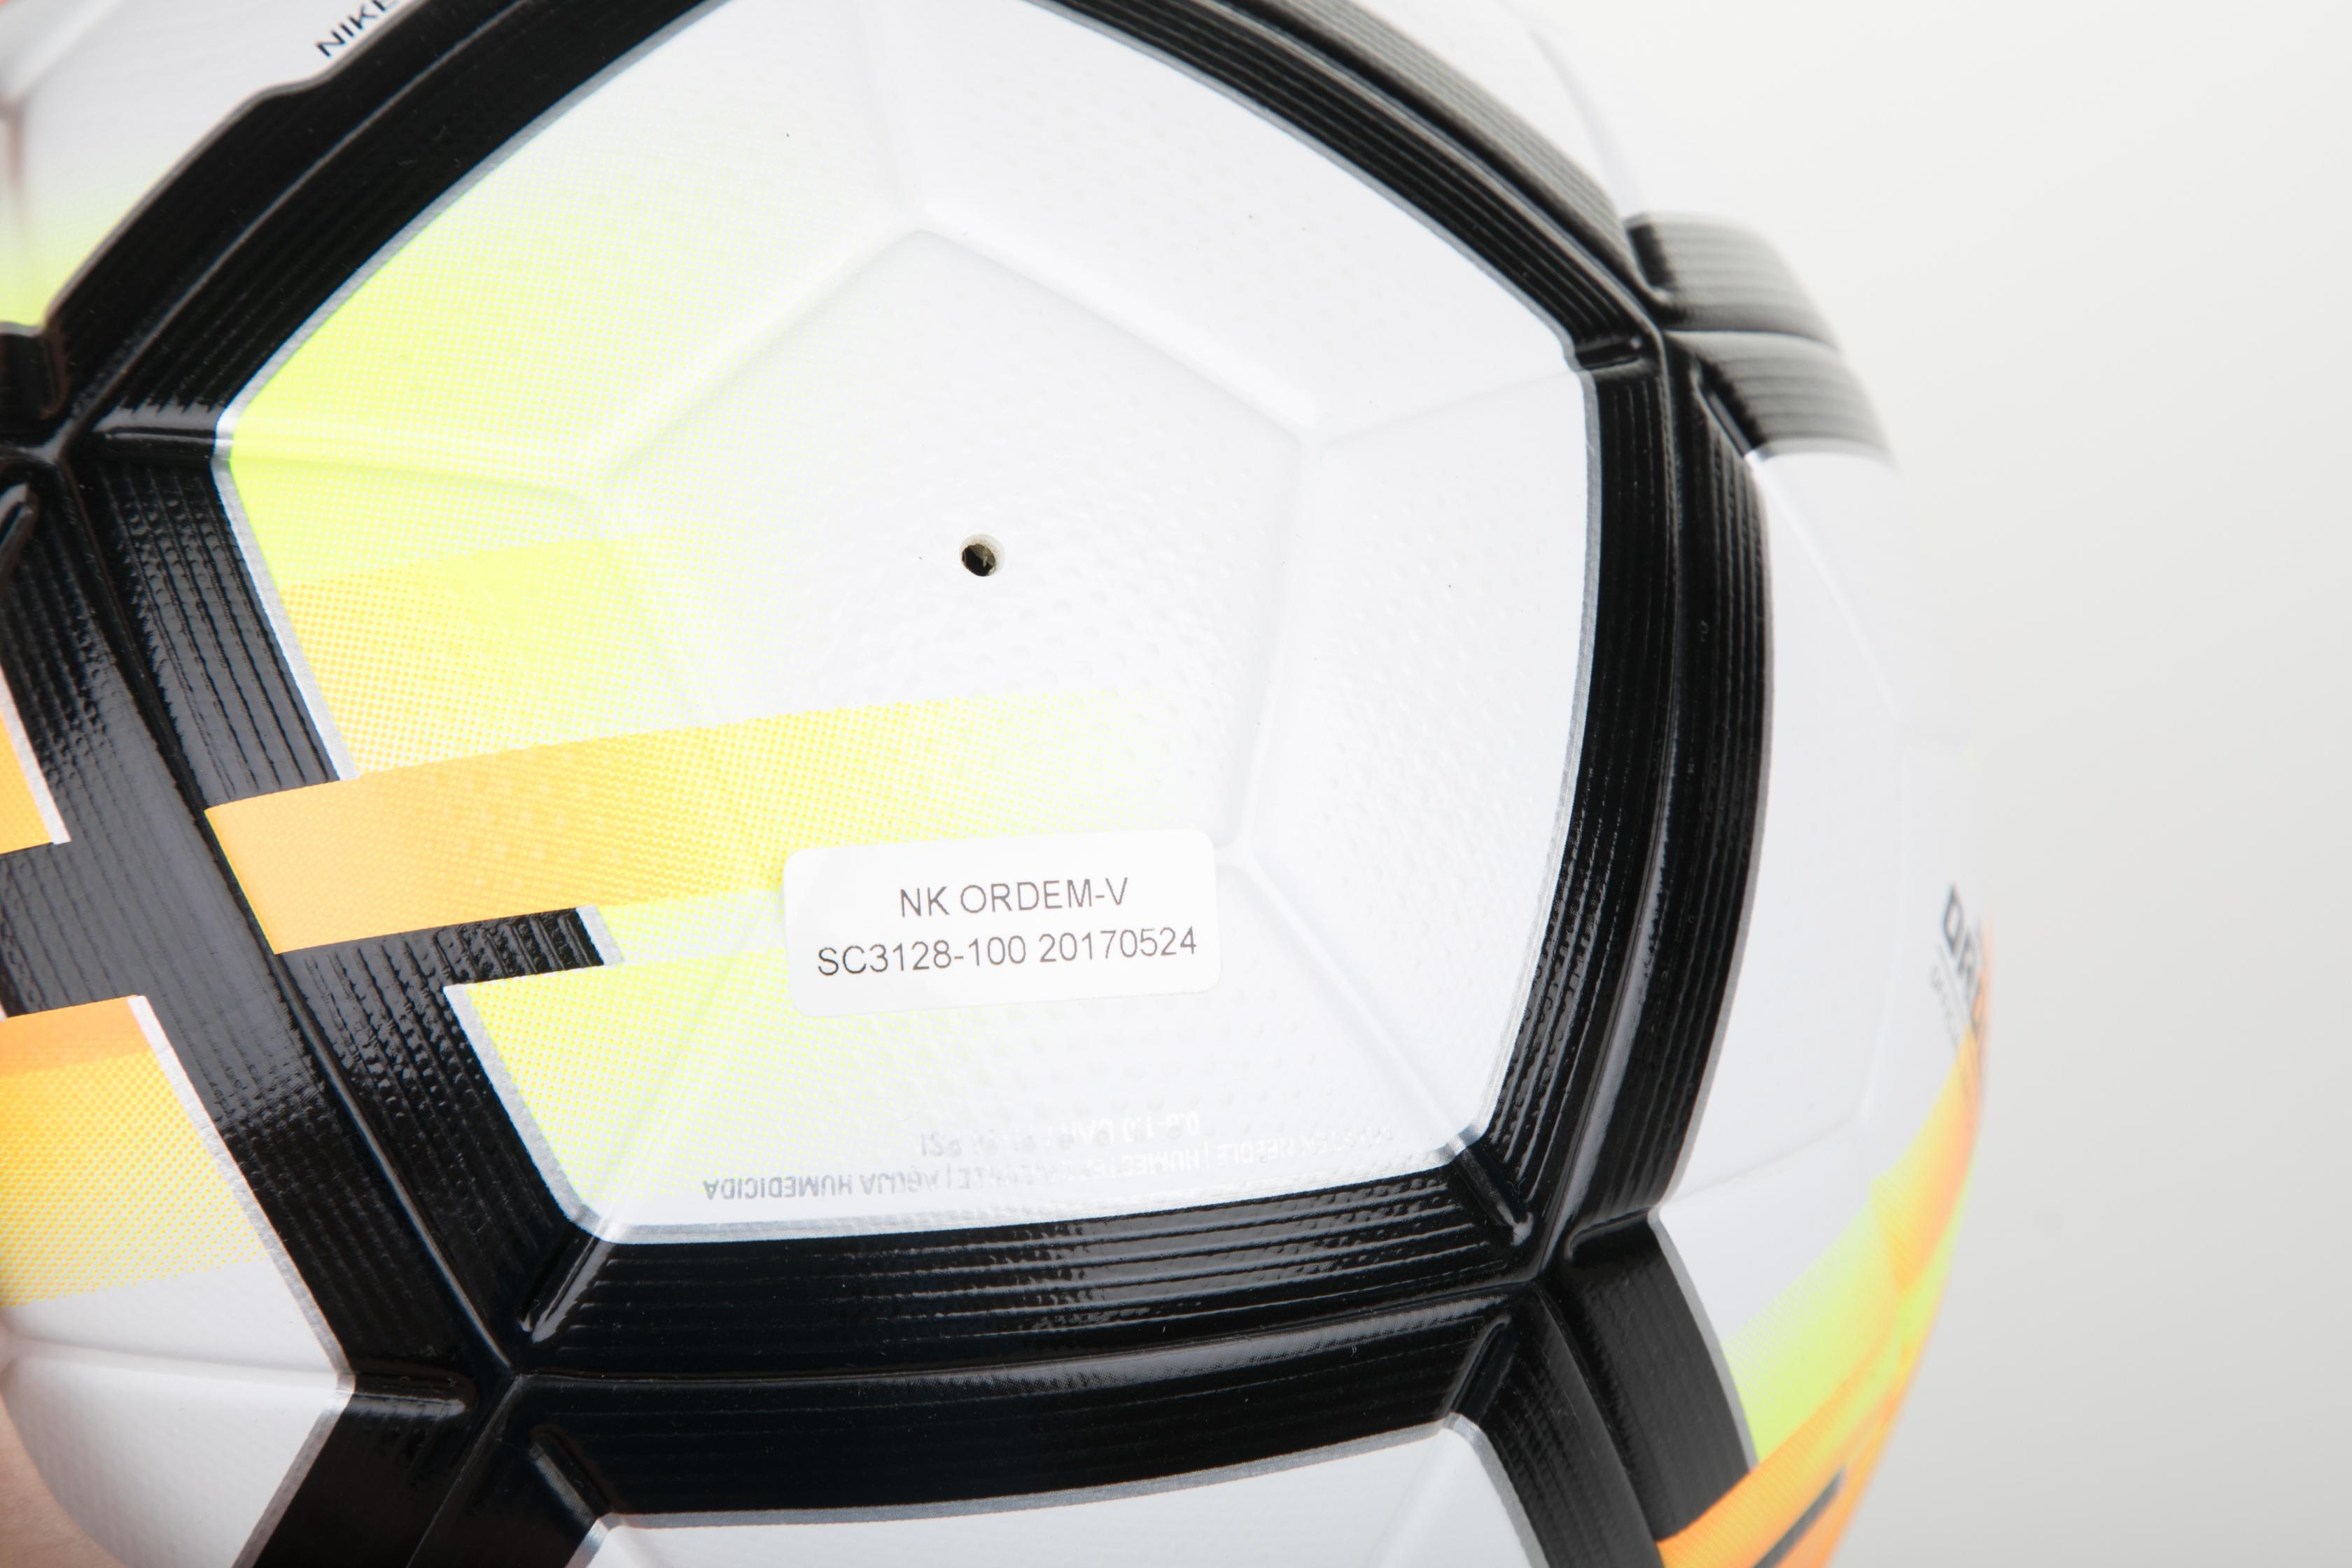 94ac91a760e NIKE - Μπάλα ποδοσφαίρου NIKE ORDEM-V λευκή-πορτοκαλί, Μπάλες, ΕΞΟΠΛΙΣΜΟΣ | ΑΘΛΗΤΙΚΑ  ΕΙΔΗ | ΜΠΑΛΕΣ